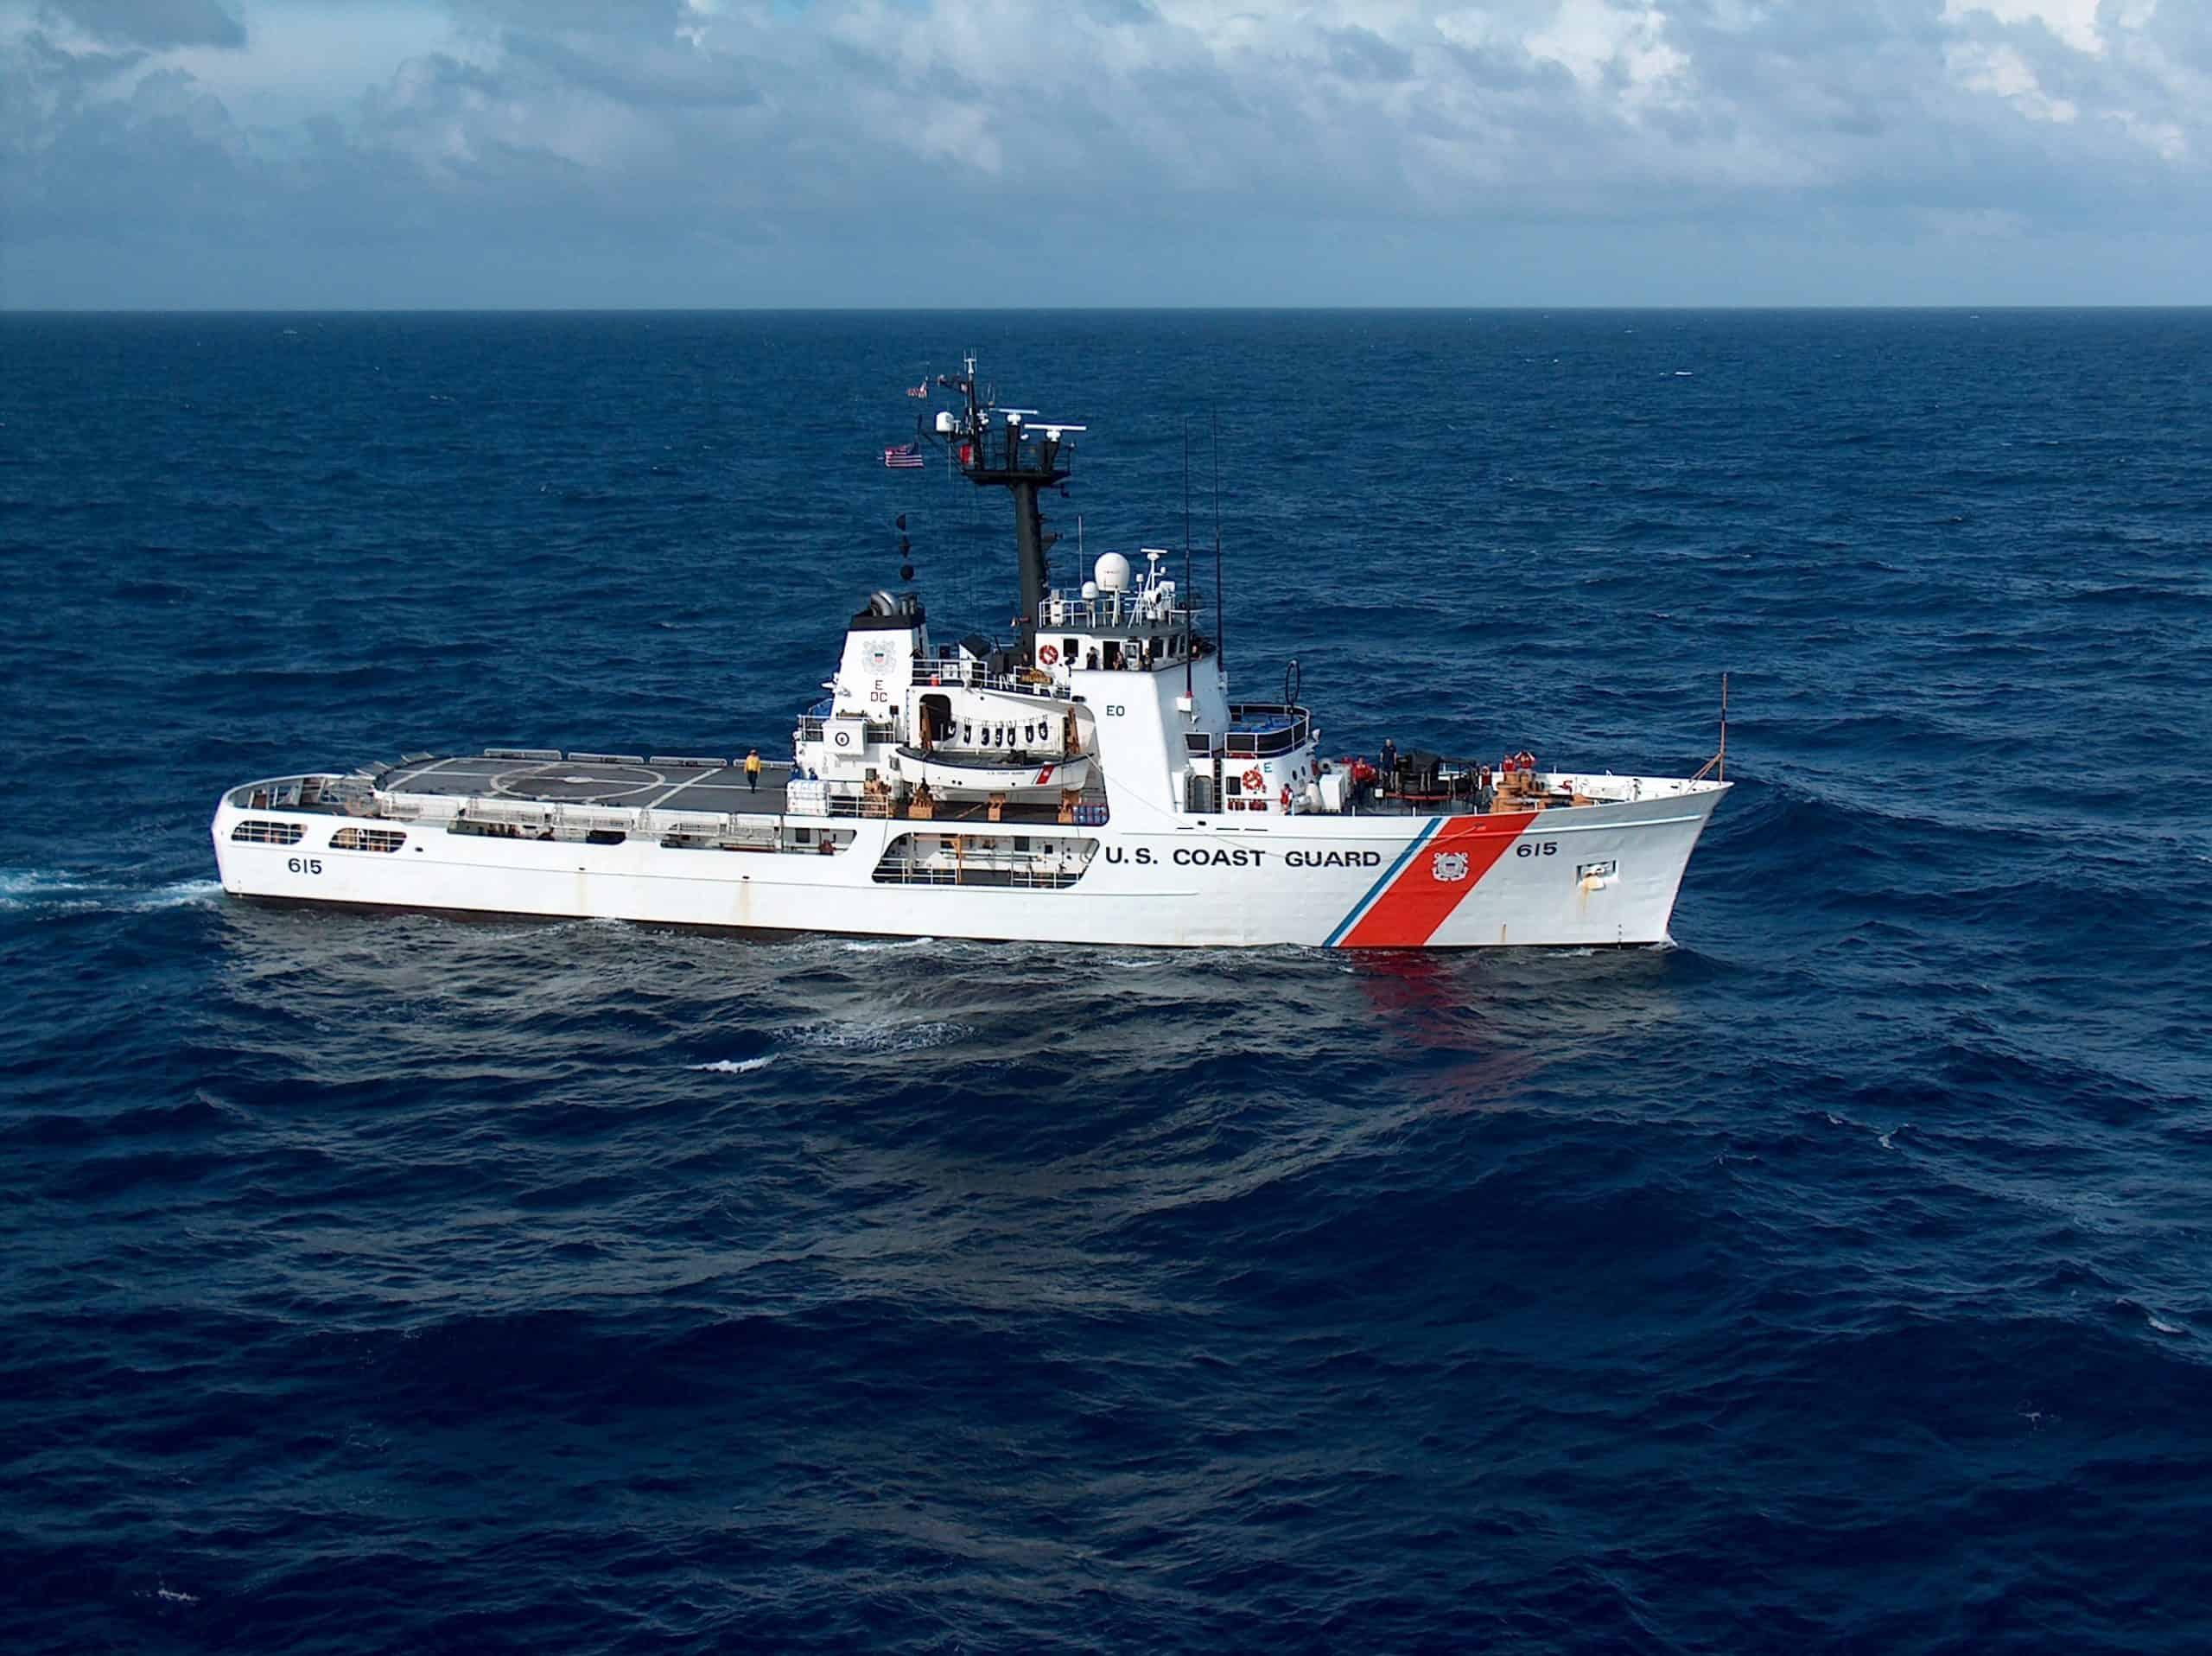 Патрульний корабель USCGC Reliance (WMEC-615) Берегової охорони США